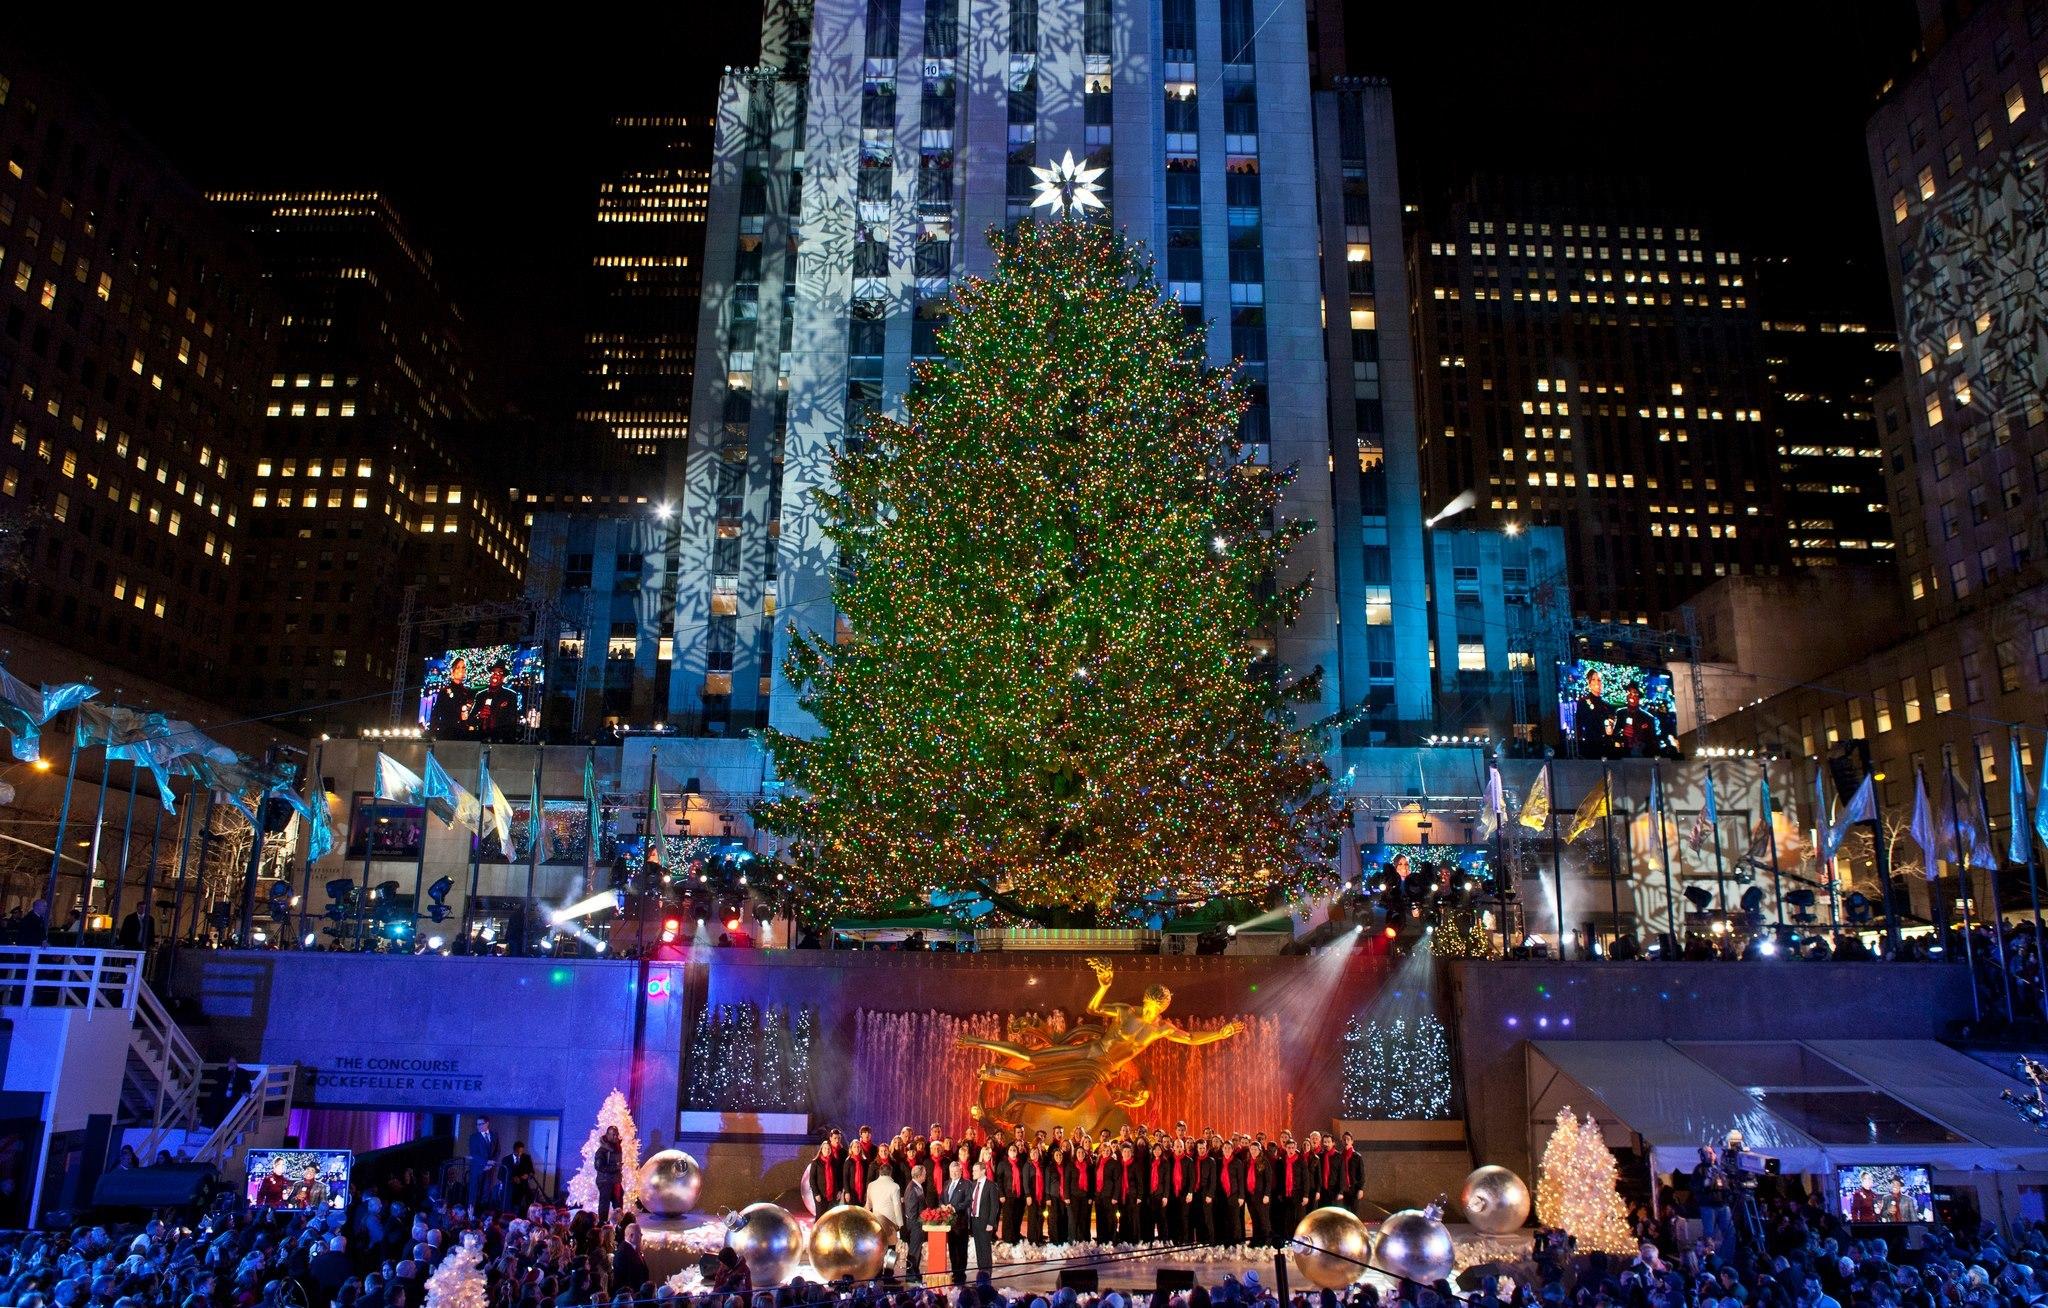 Nyc Christmas Tree Lighting 2019.New York Christmas Tree Lighting Live Stream